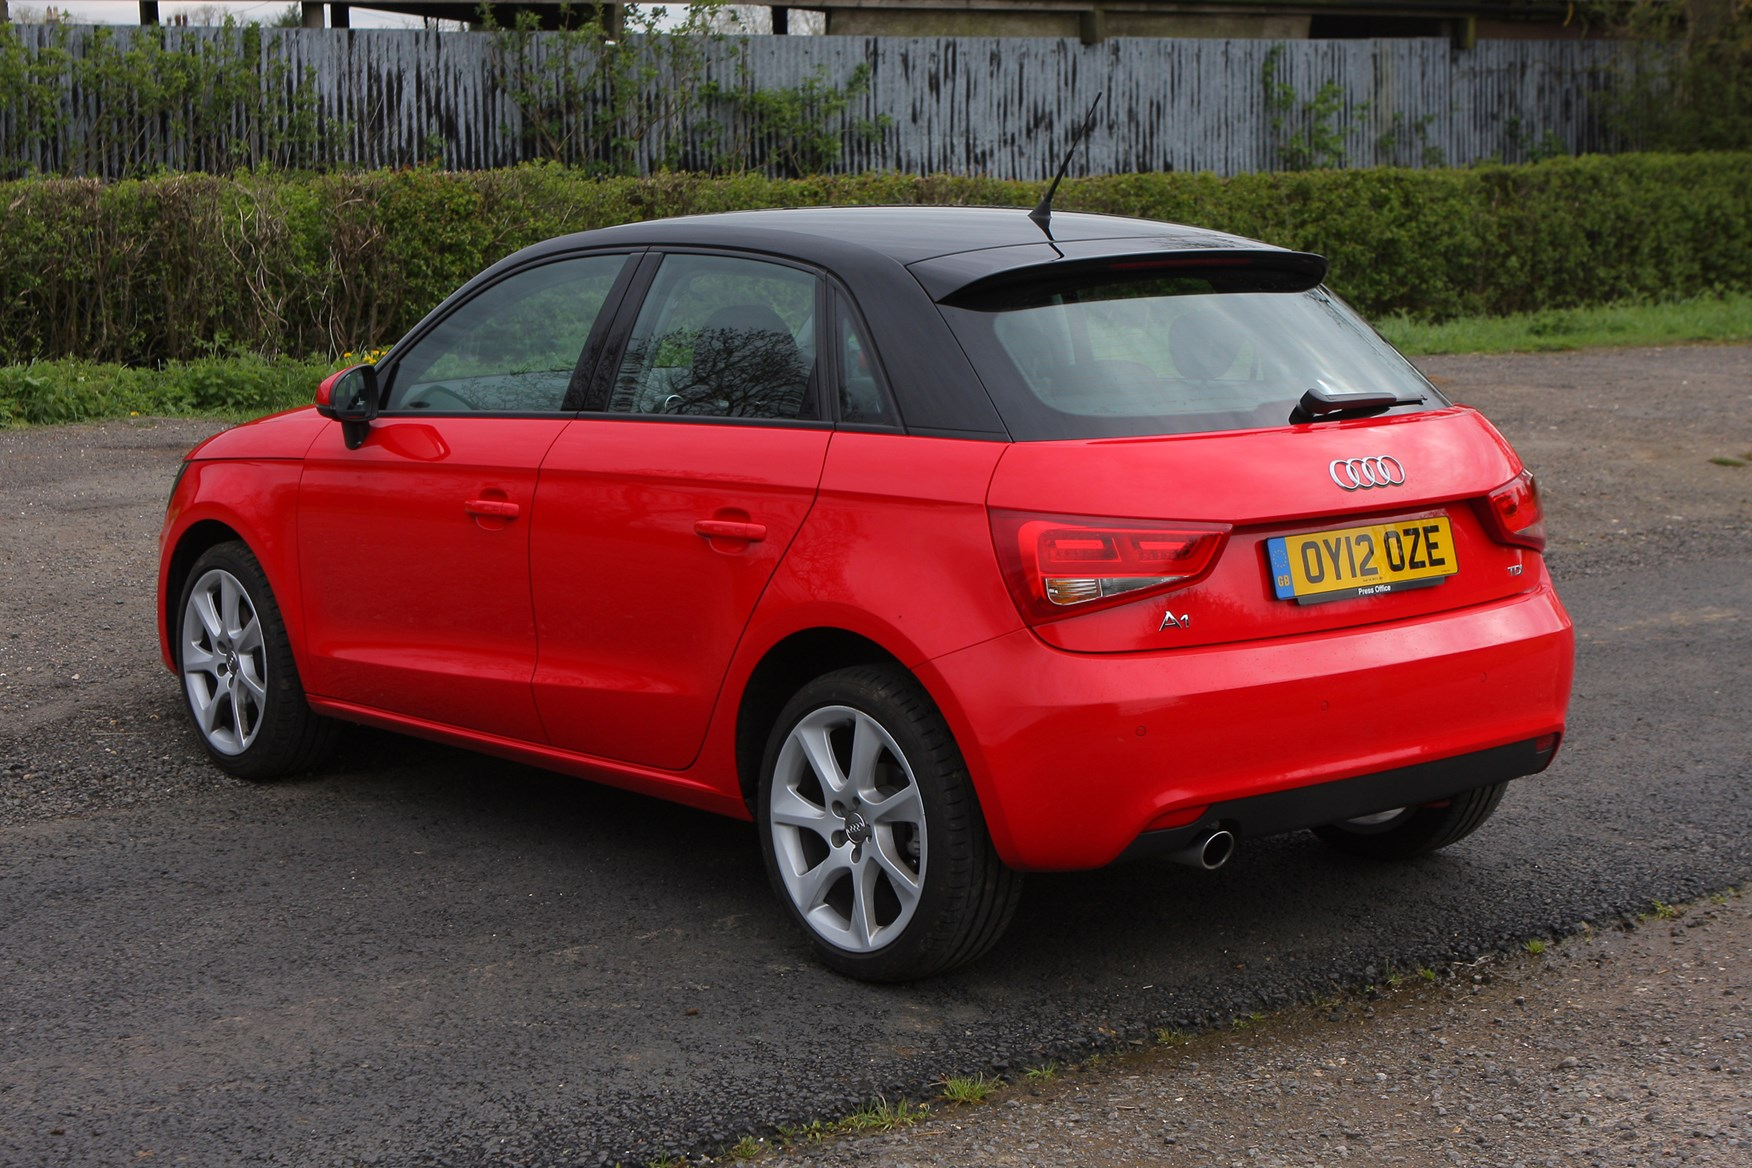 2010 Audi A1 Sportback photo - 1